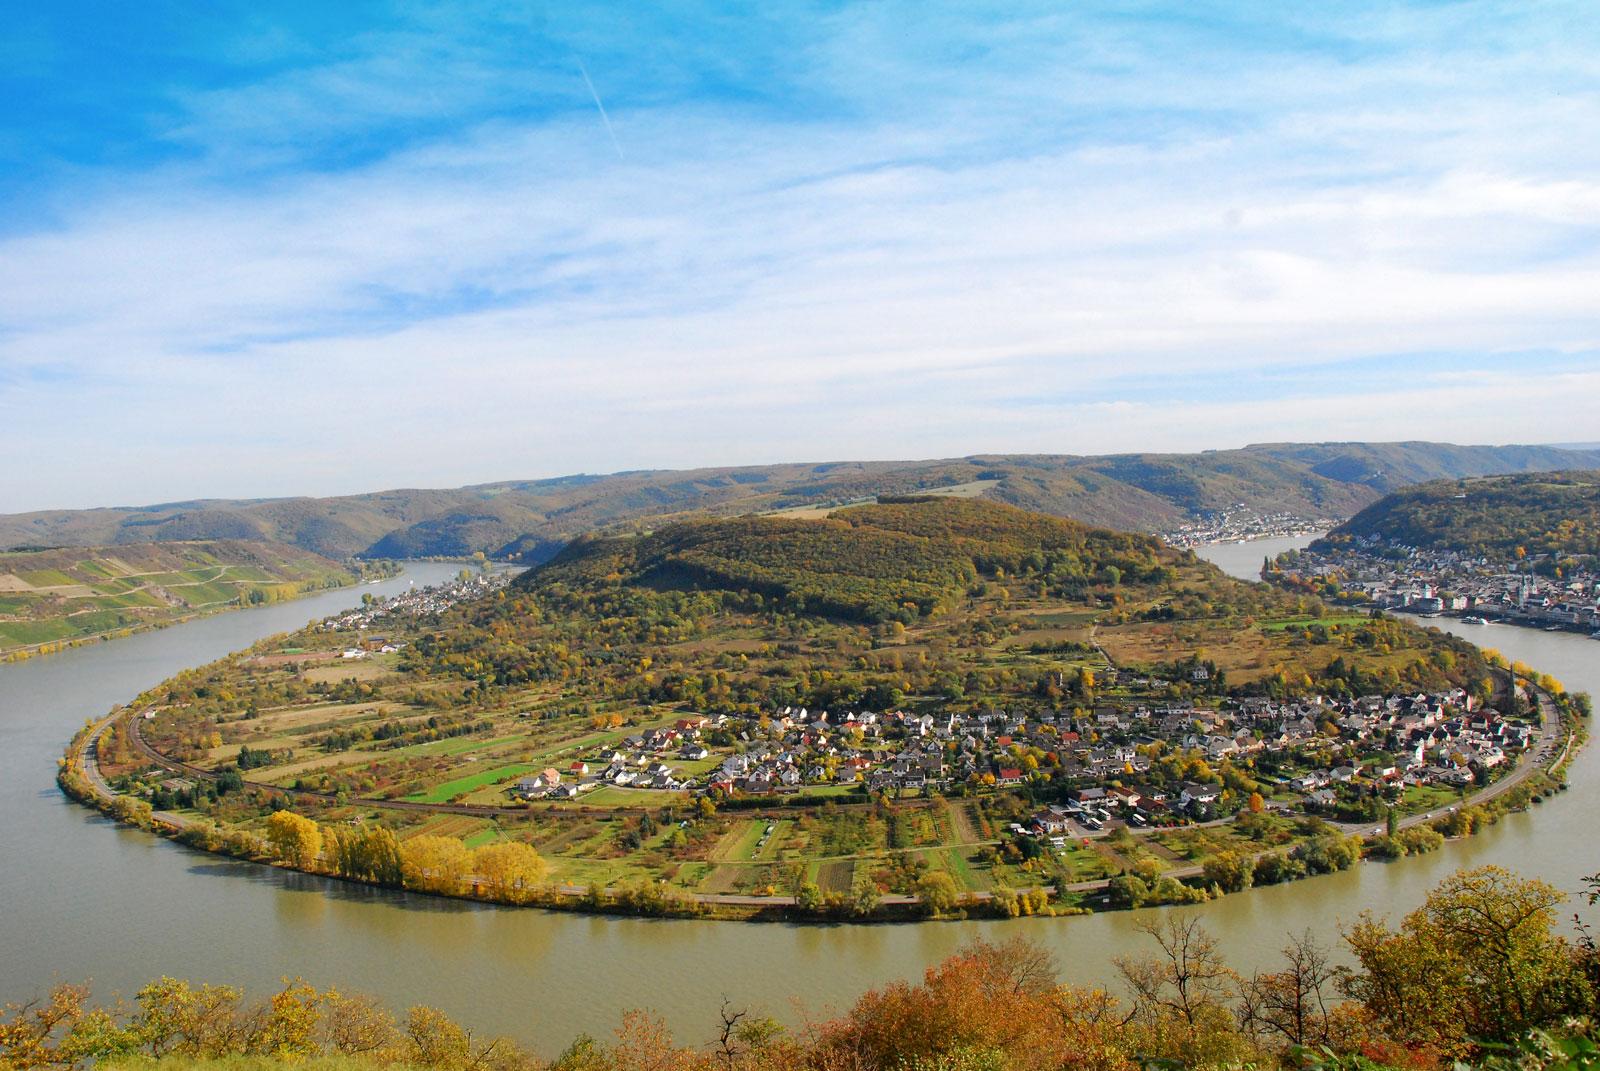 Klettersteig Pfalz : Klettersteige rioler klettersteig km bergwelten